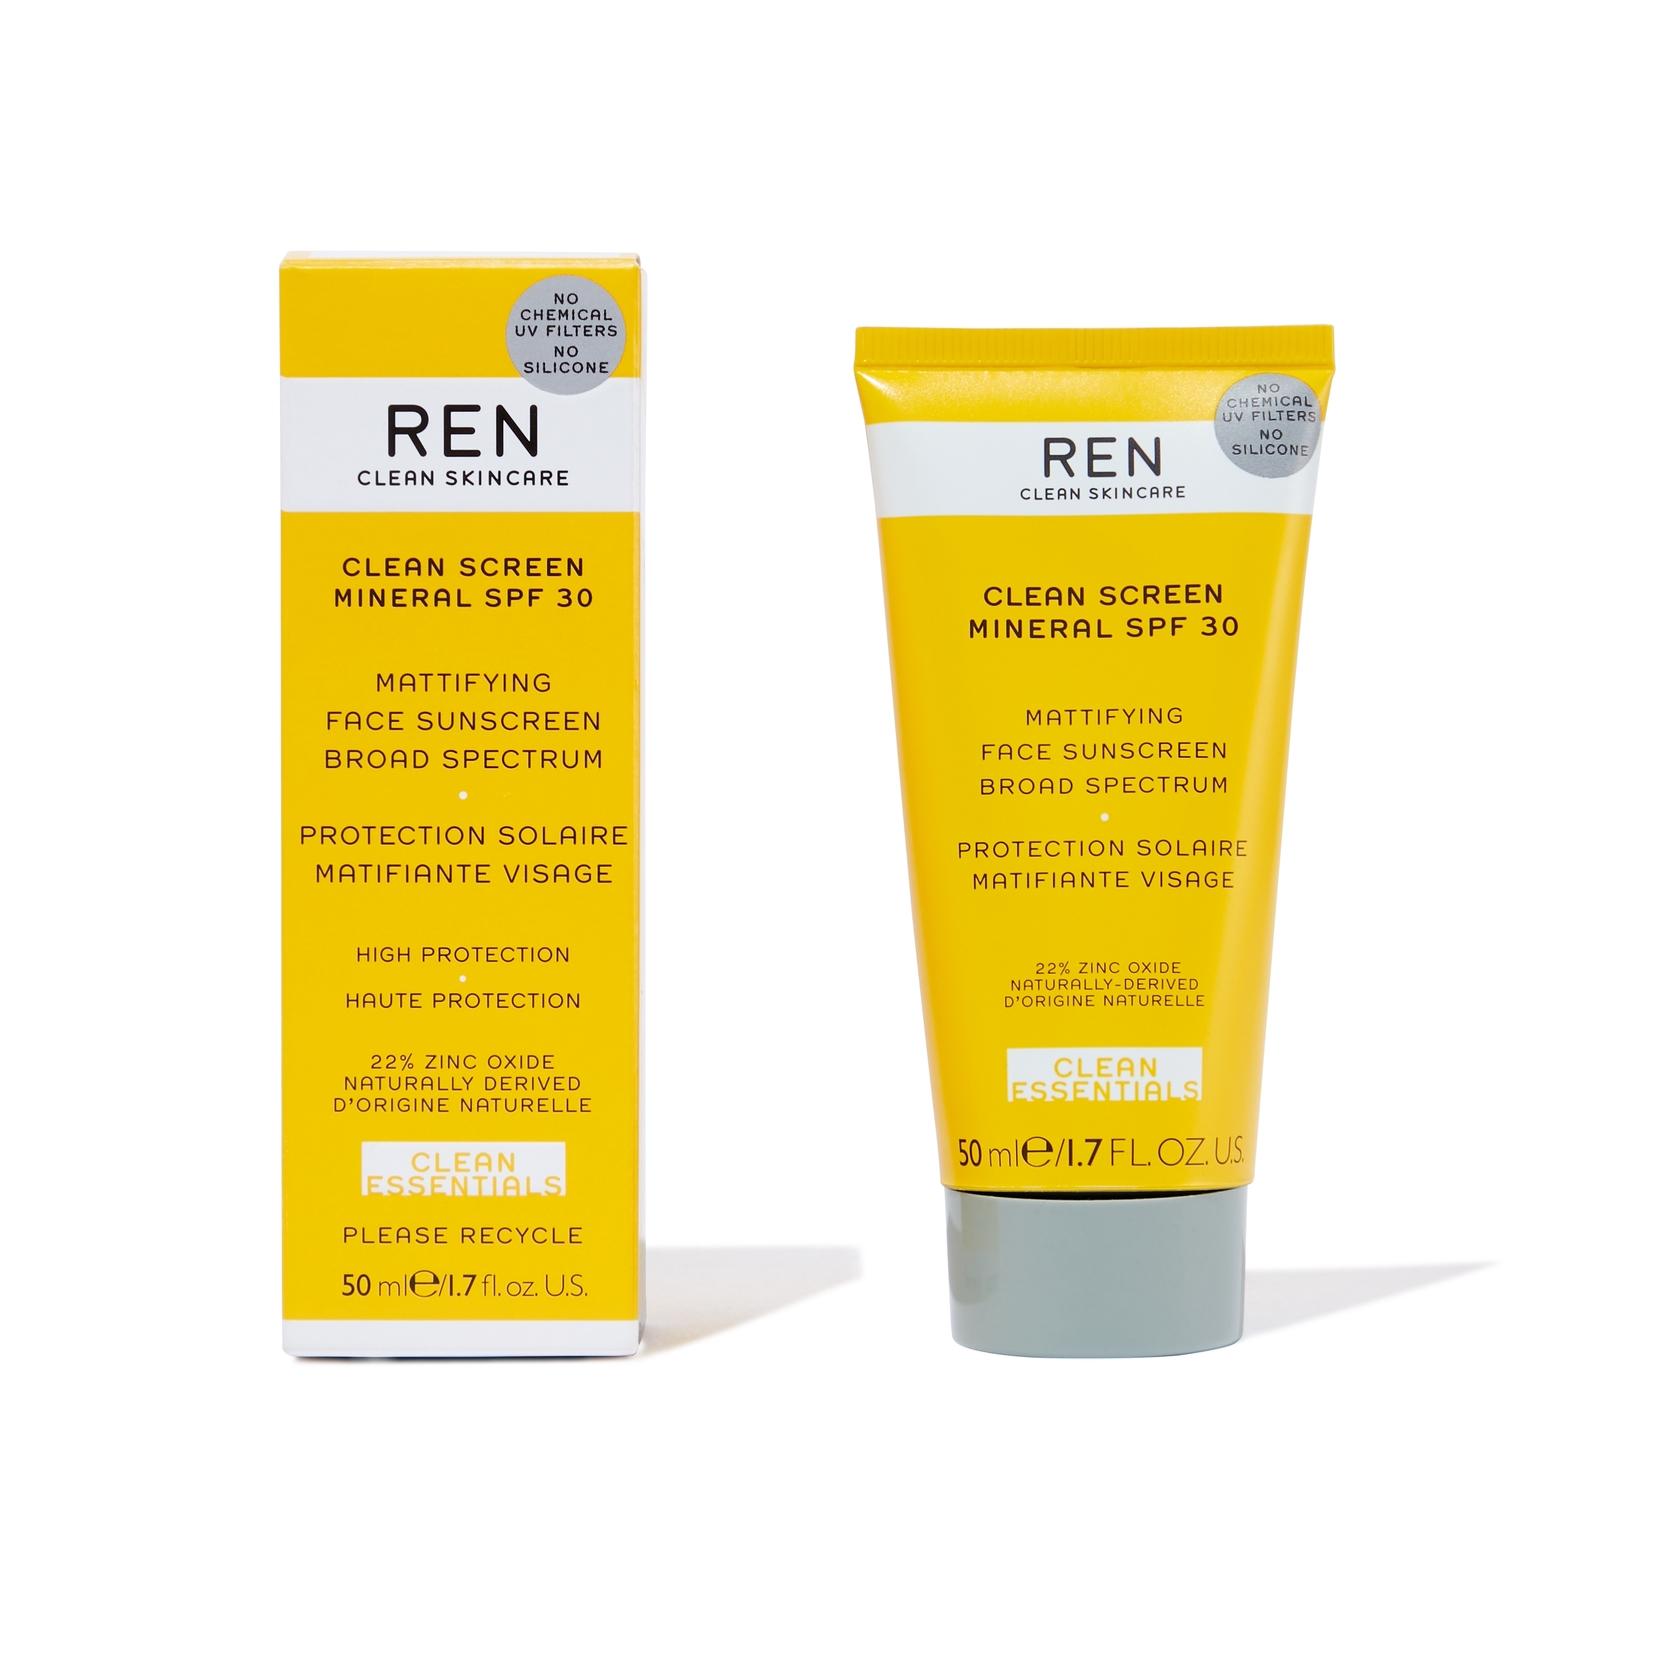 Clean Screen Mineral SPF 30 de REN Clean Skincare